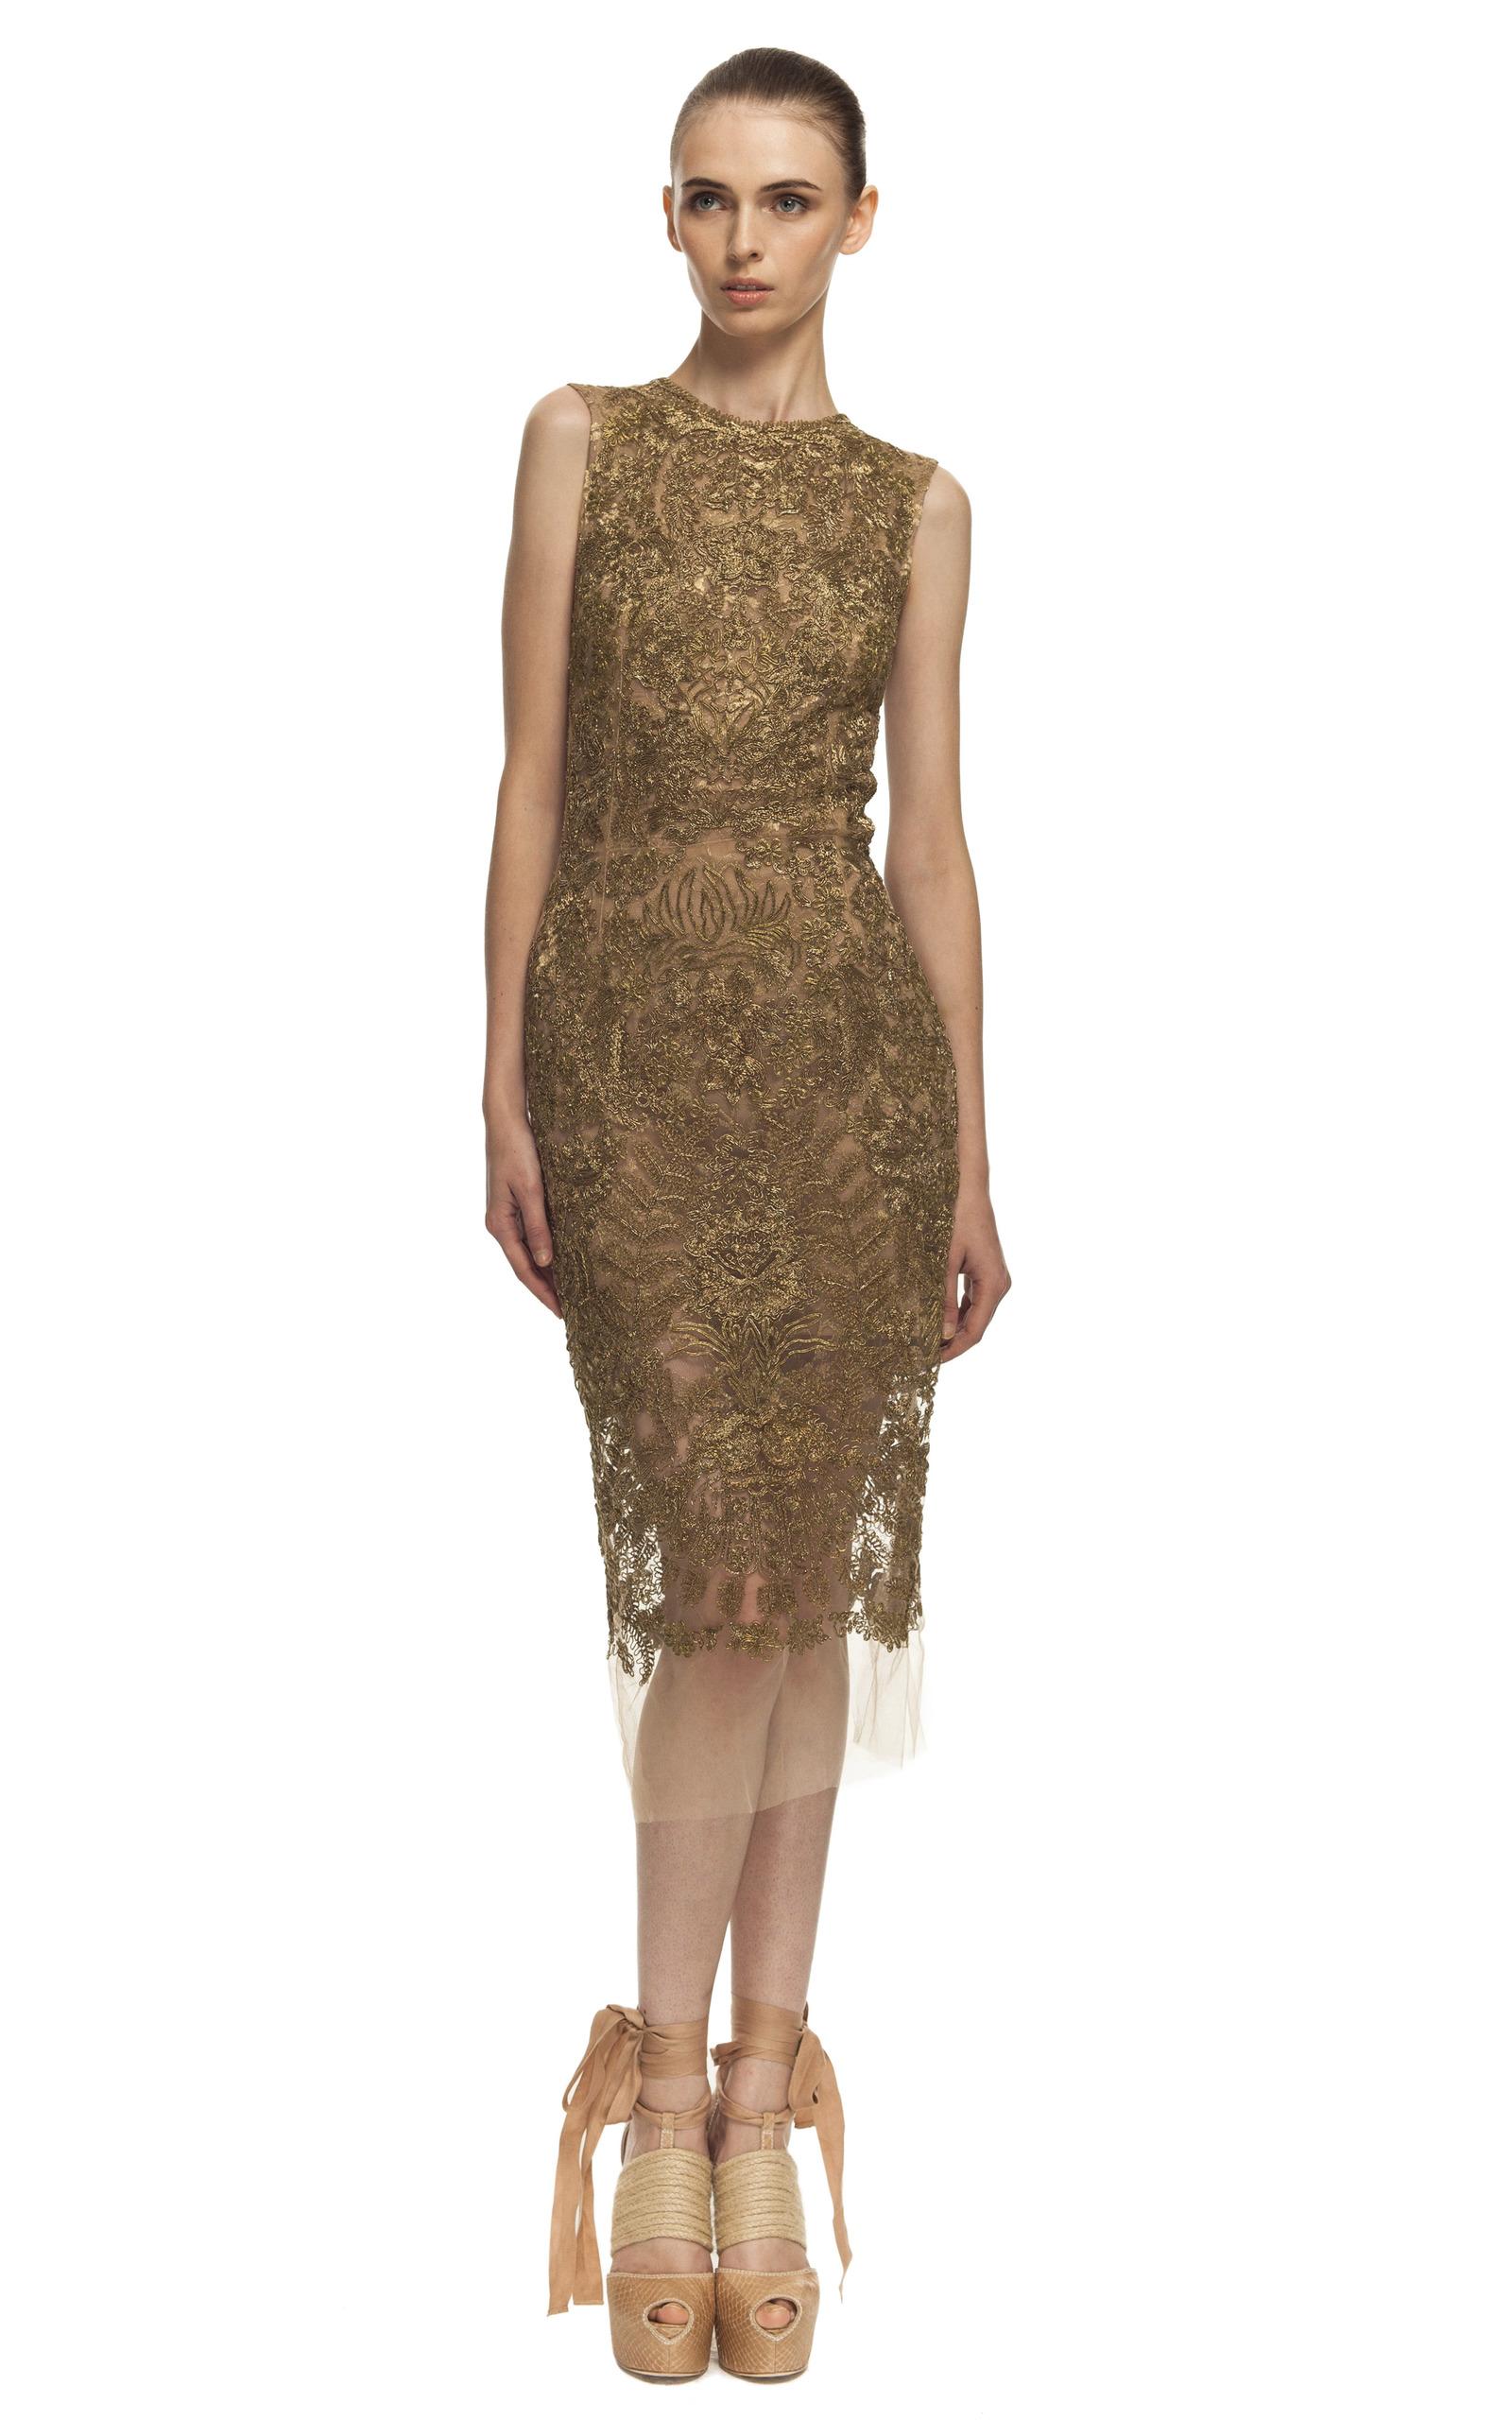 Embroidered Lace Sheath Dress by Vera Wang